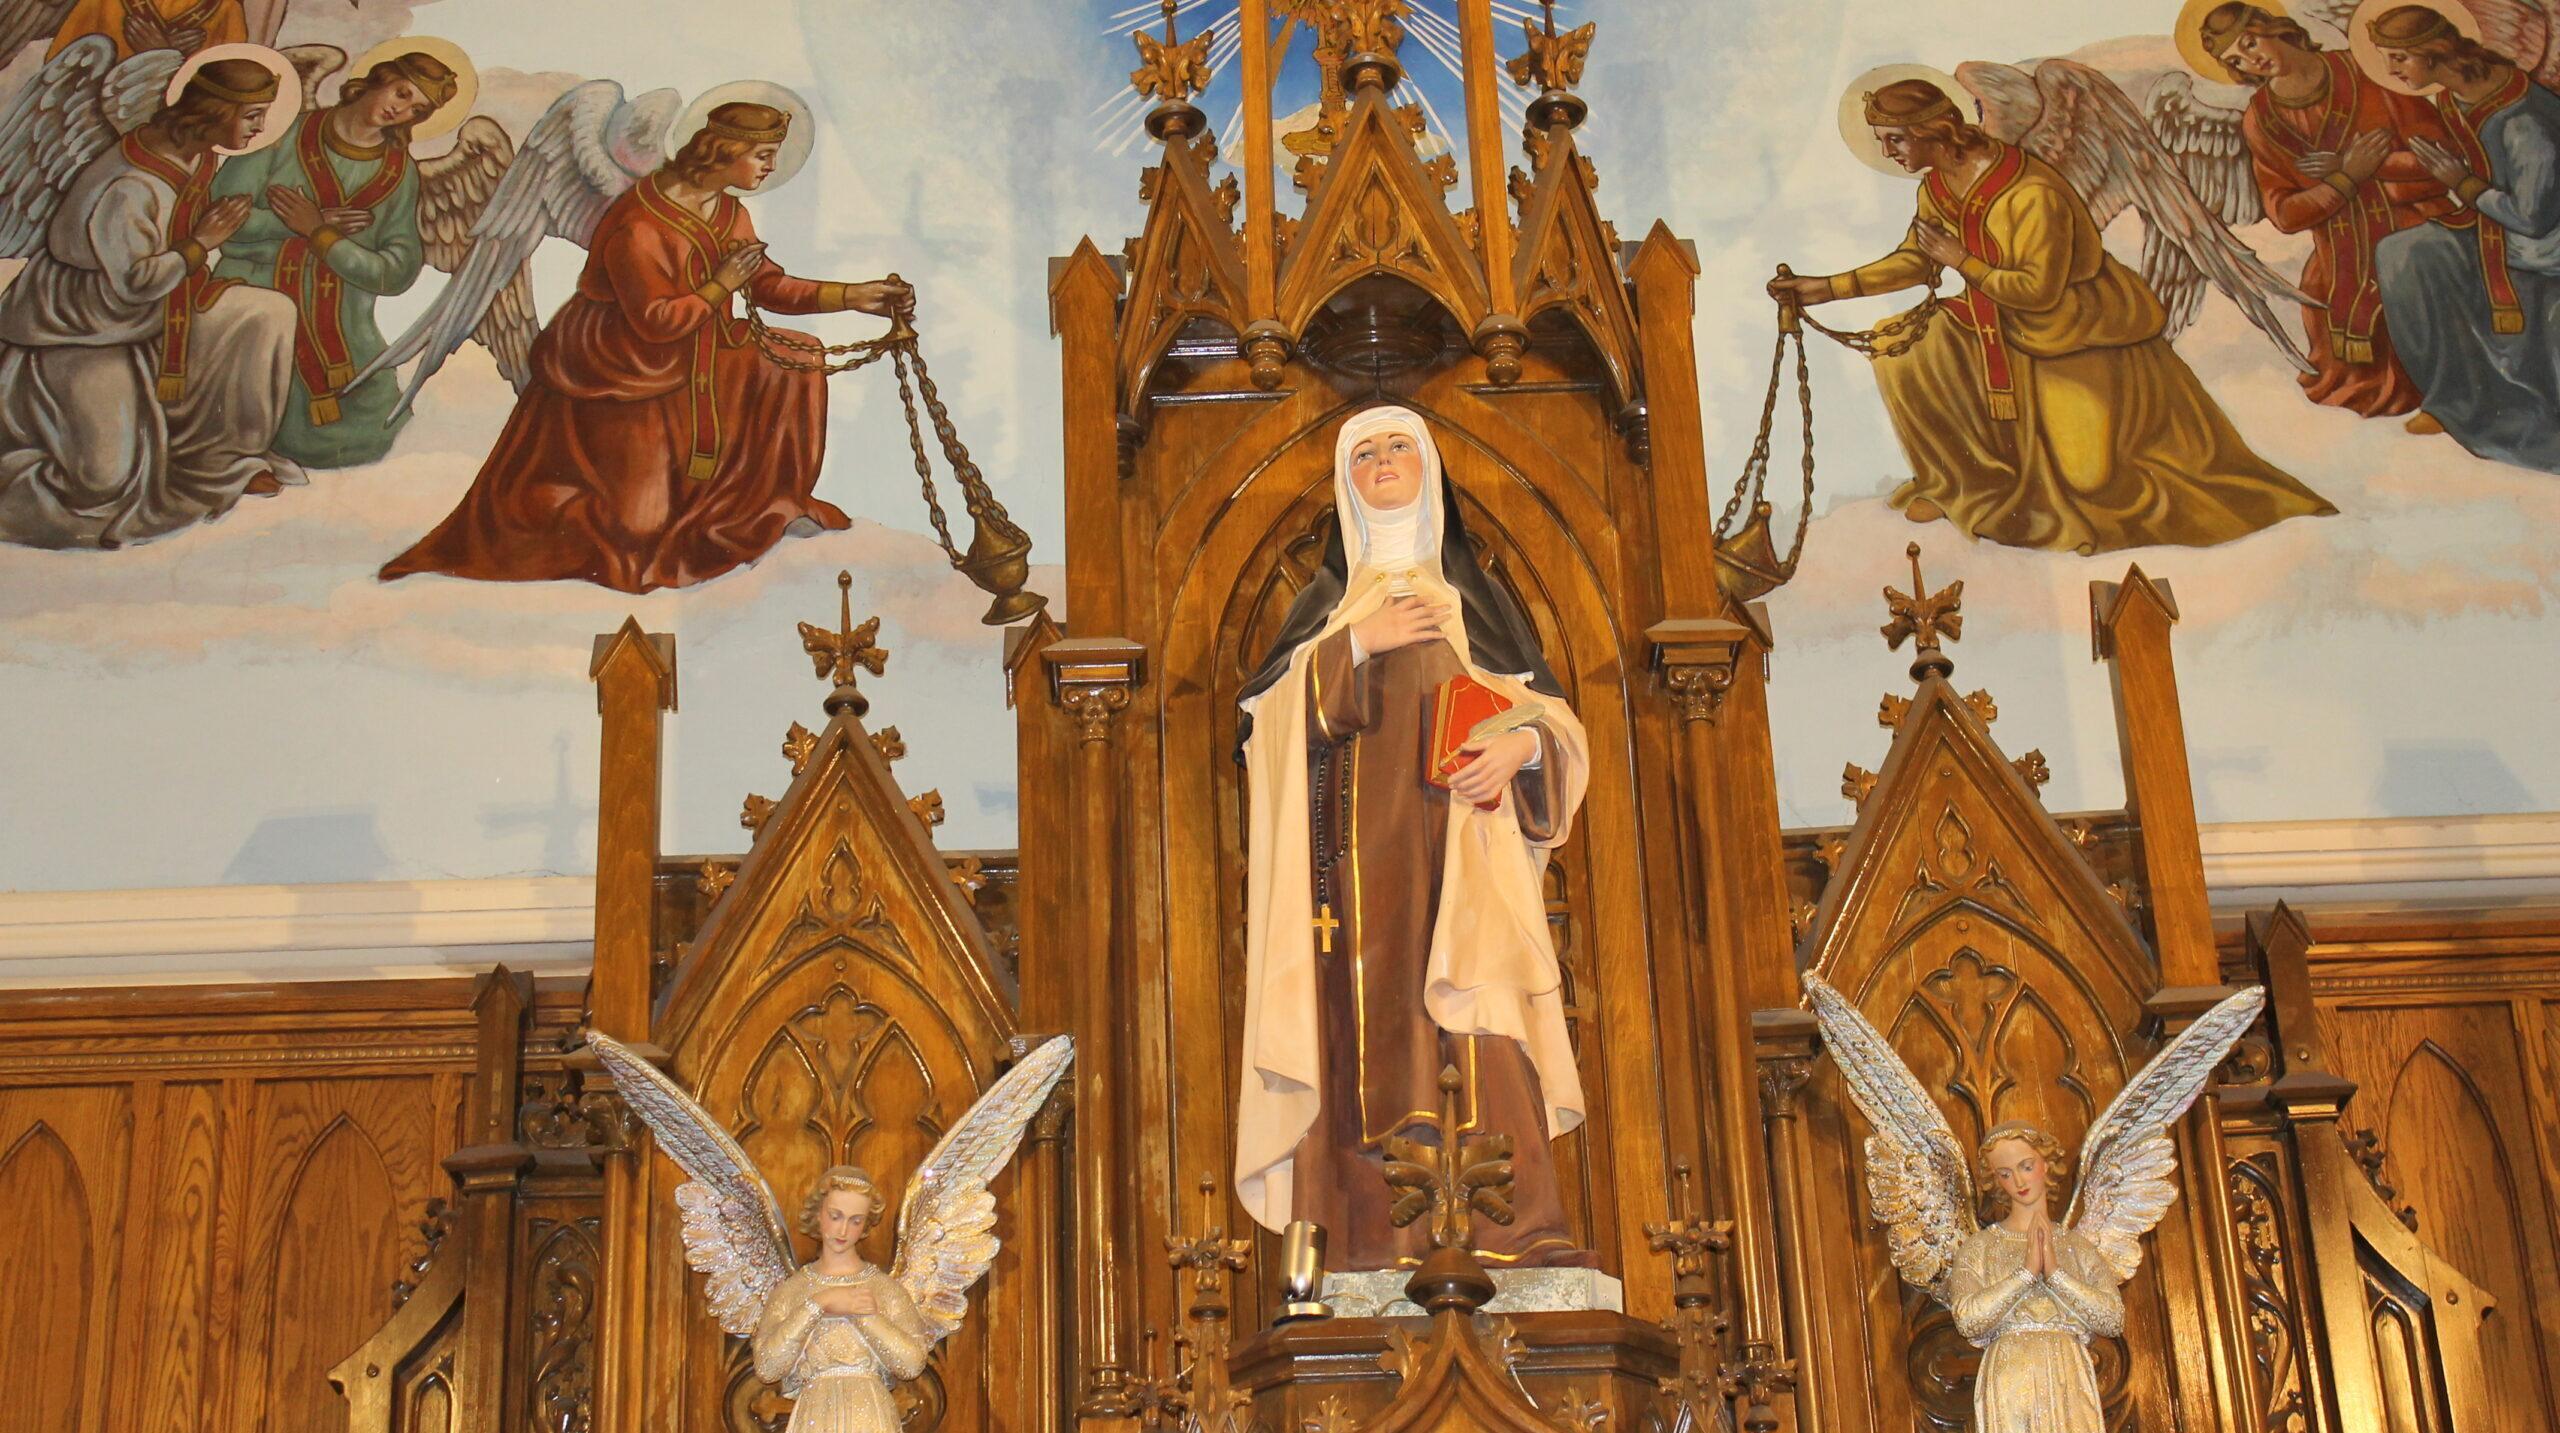 St. Teresa Altar Piece